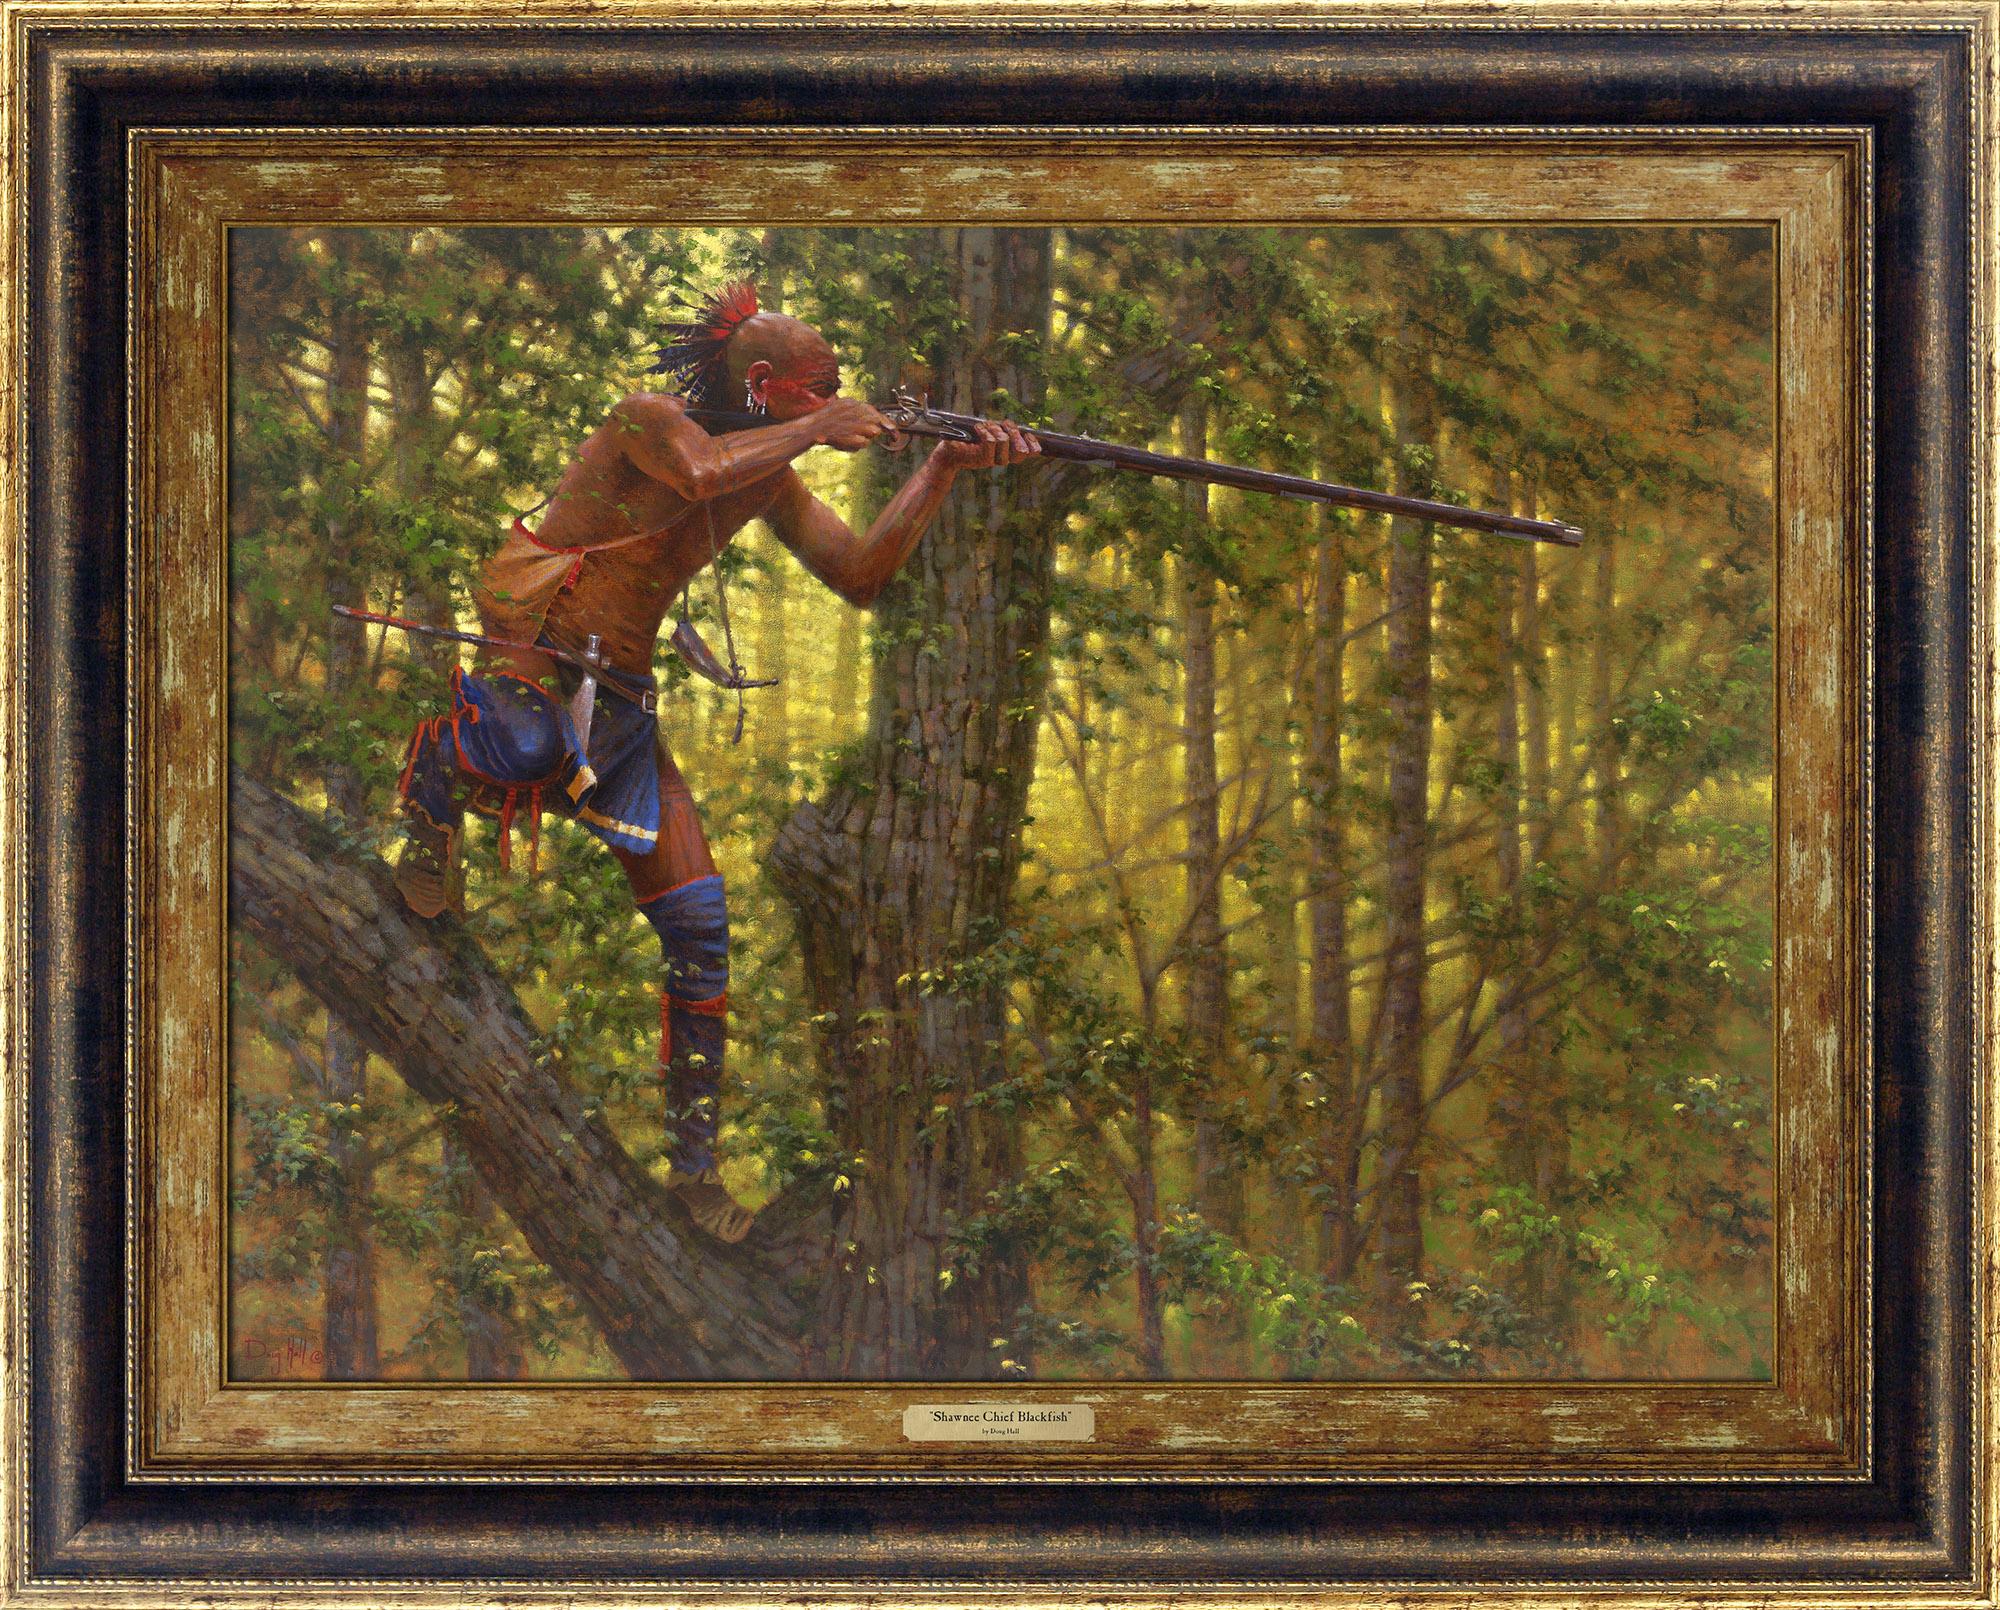 Shawnee Chief Blackfish_ 8205_612_27x36_Frame | Giclée